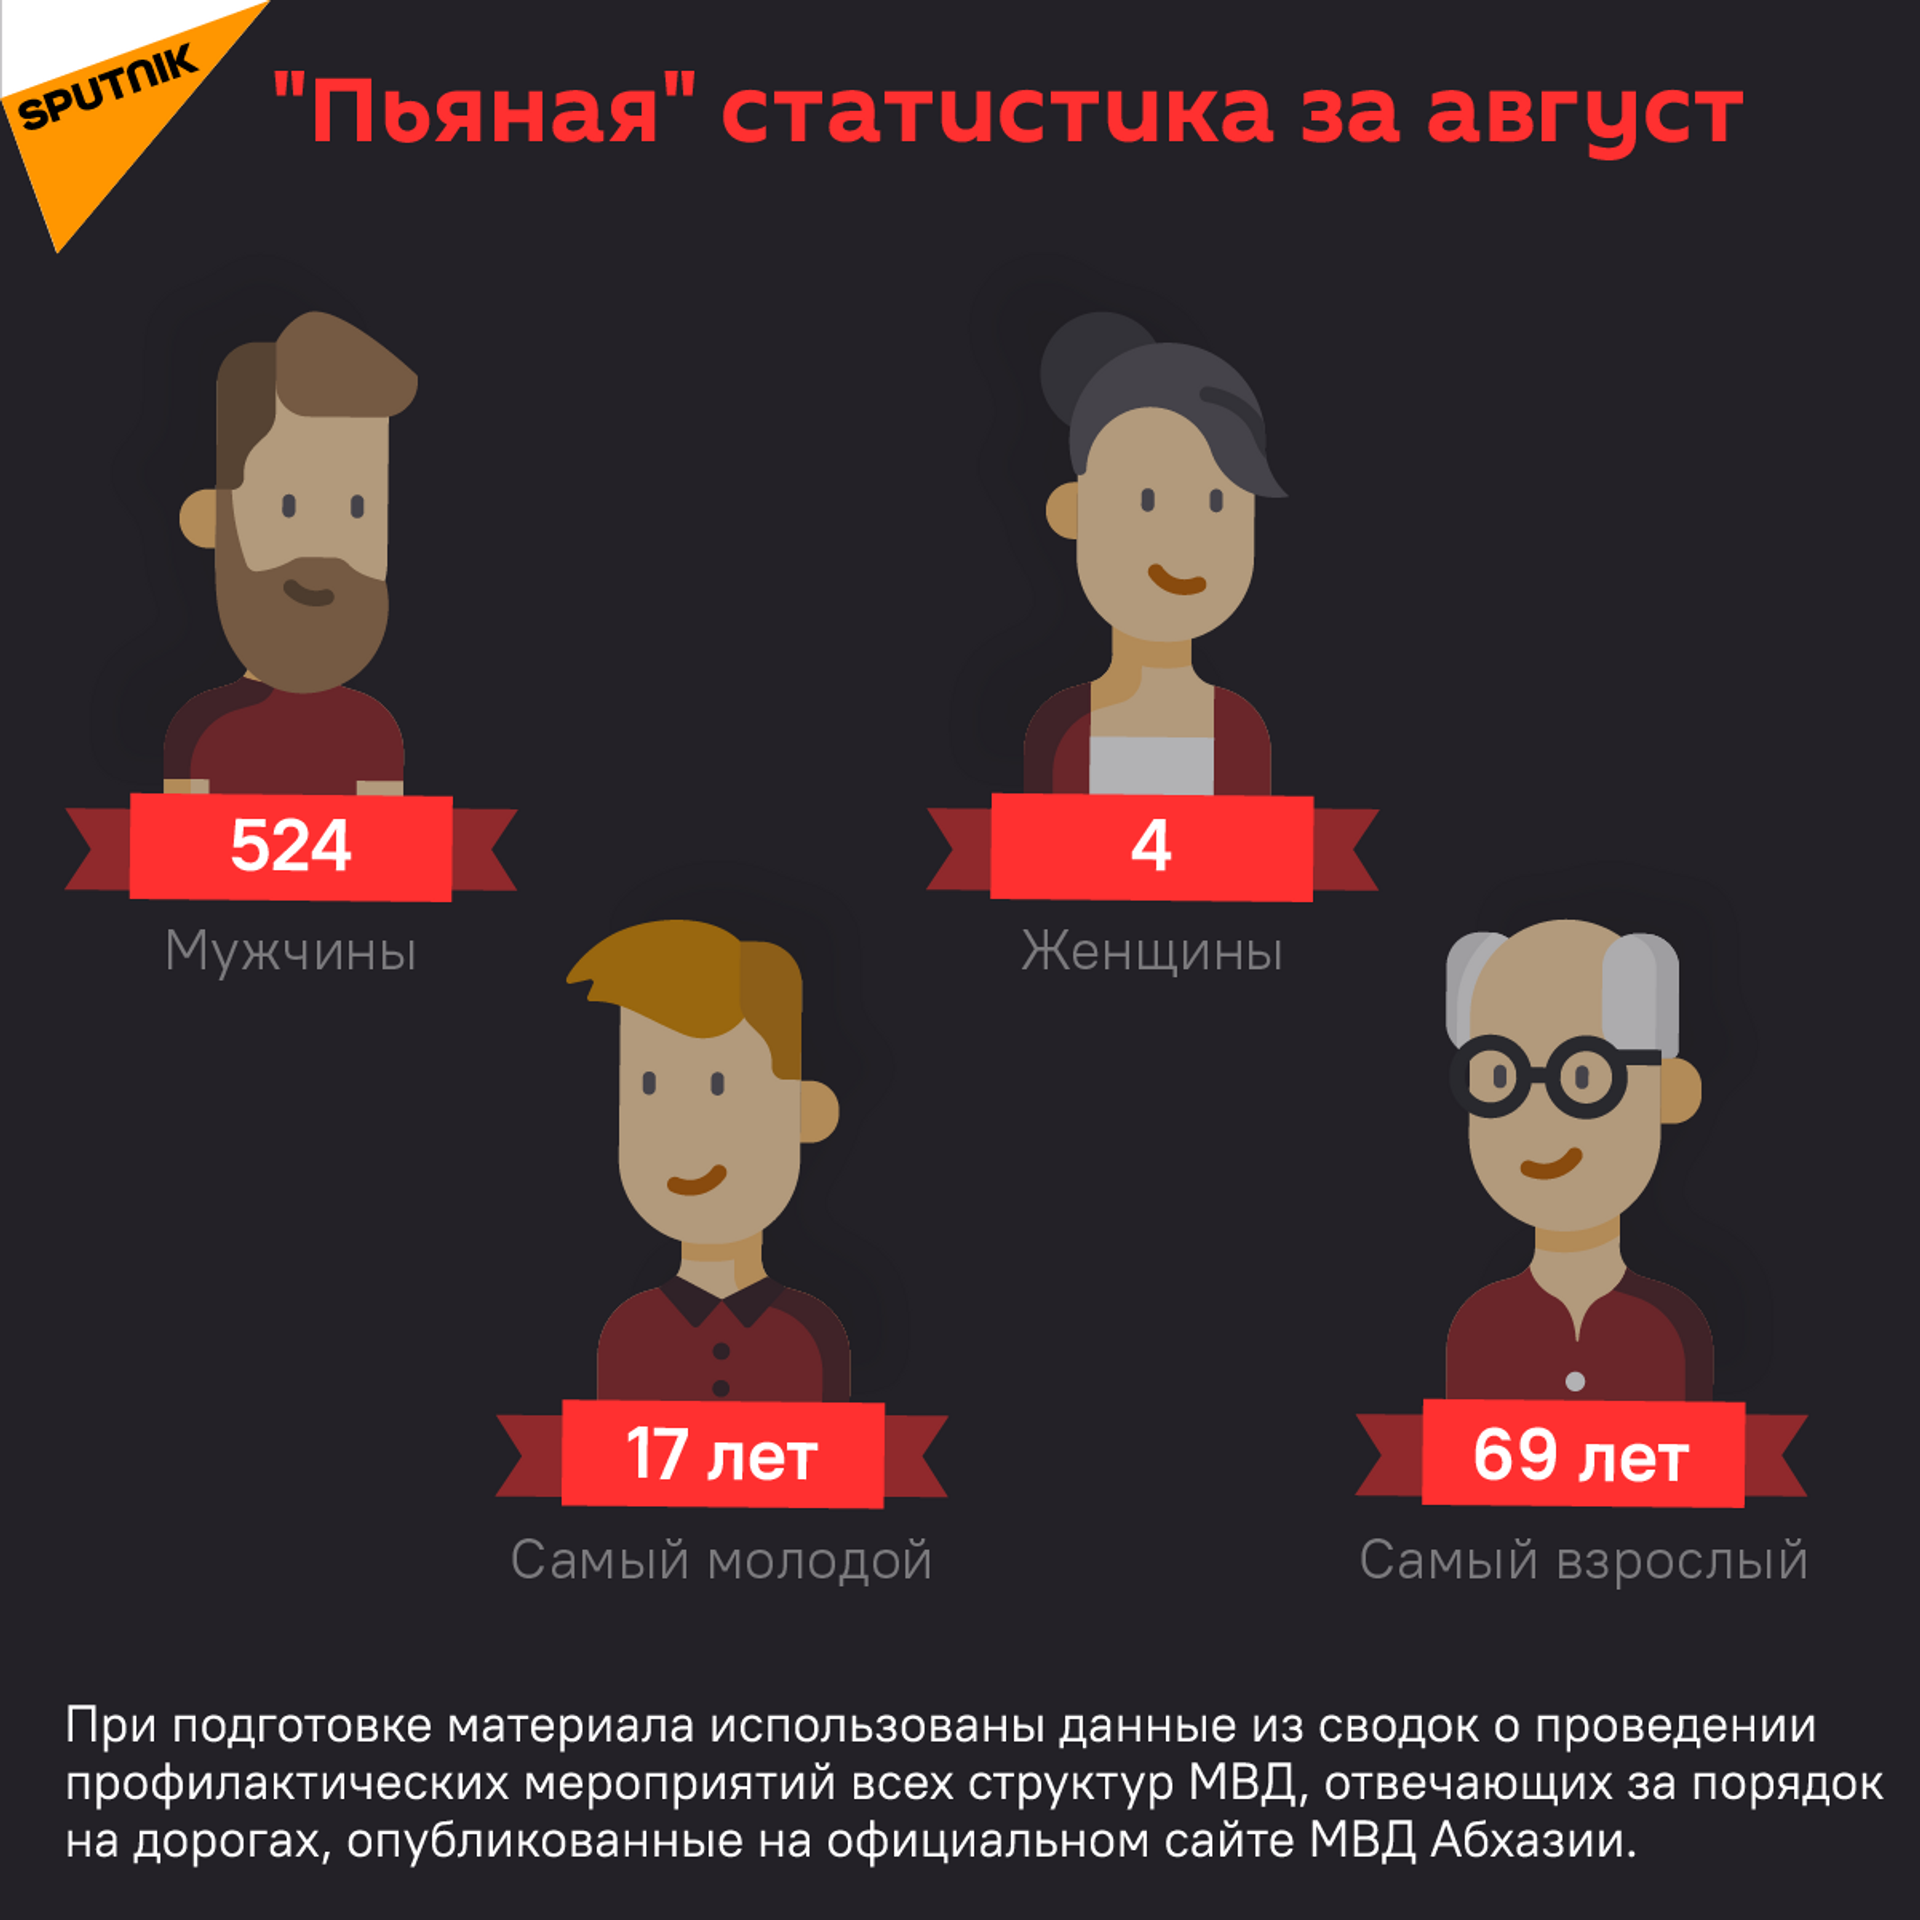 Пьяная статистика за август  - Sputnik Абхазия, 1920, 12.10.2021